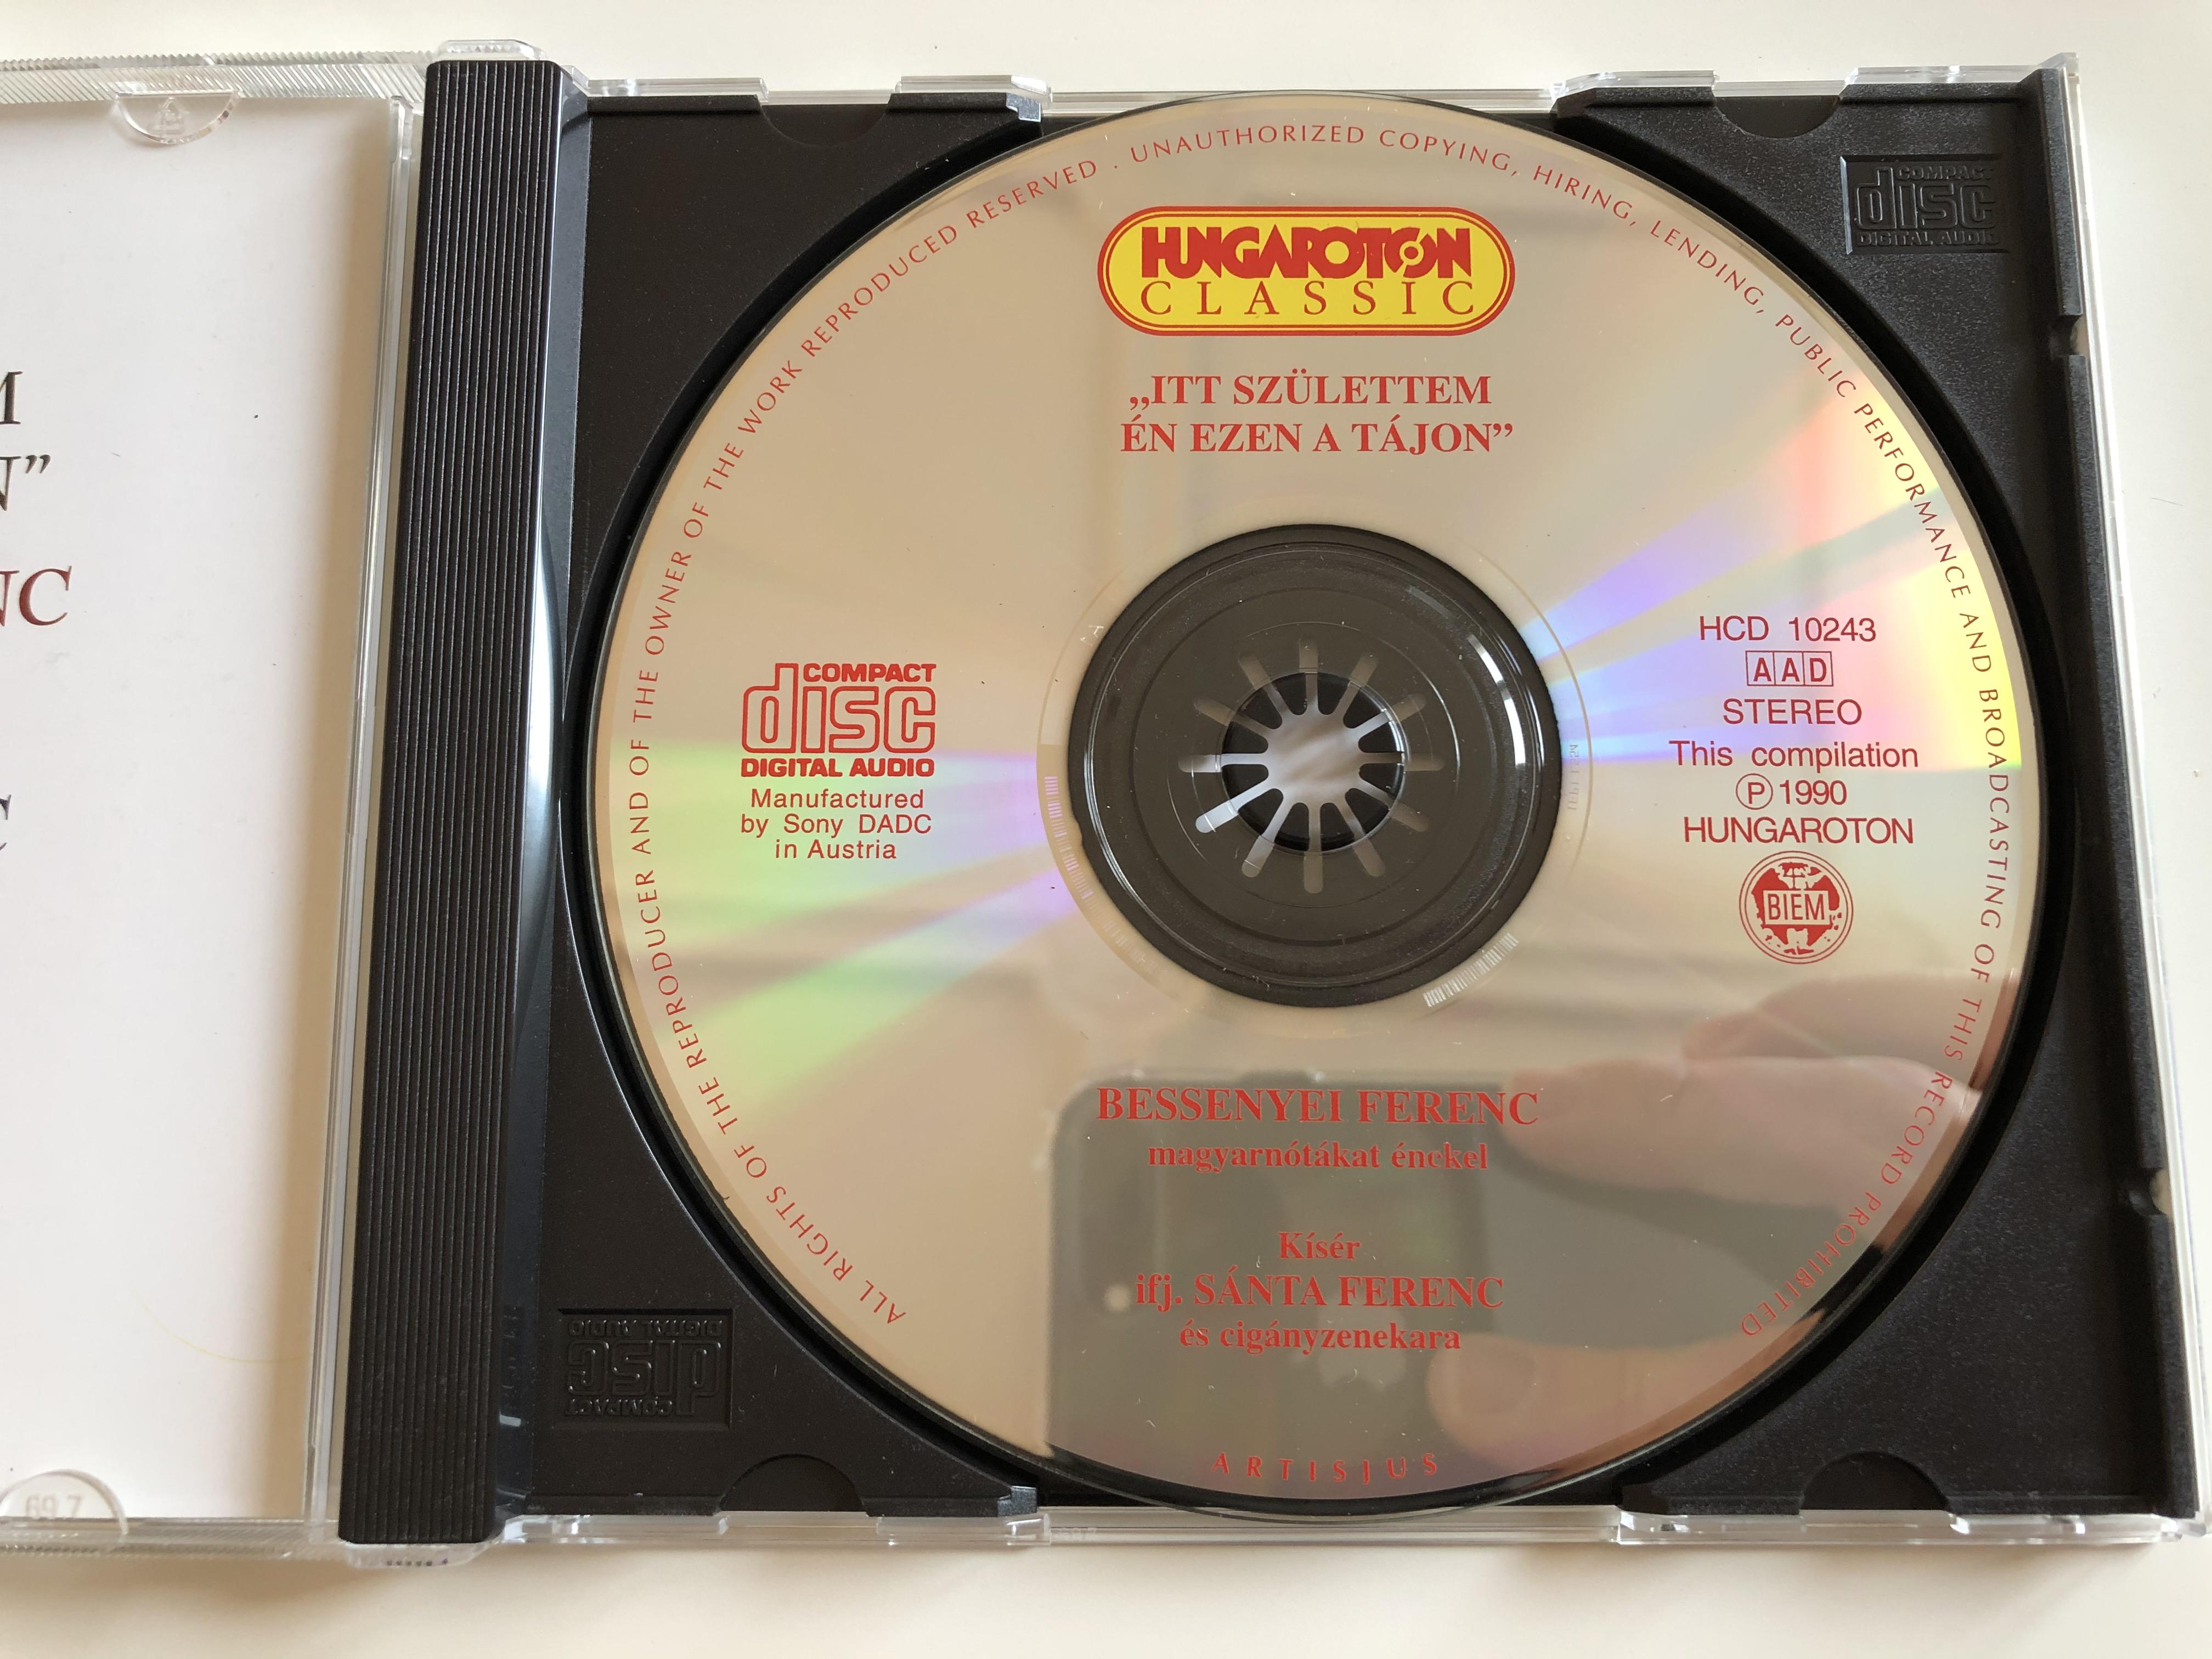 -itt-sz-lettem-n-ezen-a-t-jon-bessenyei-ferenc-kiser-ifj.-santa-ferenc-es-ciganyzenekara-hungaroton-classic-audio-cd-1990-stereo-hcd-10243-5-.jpg